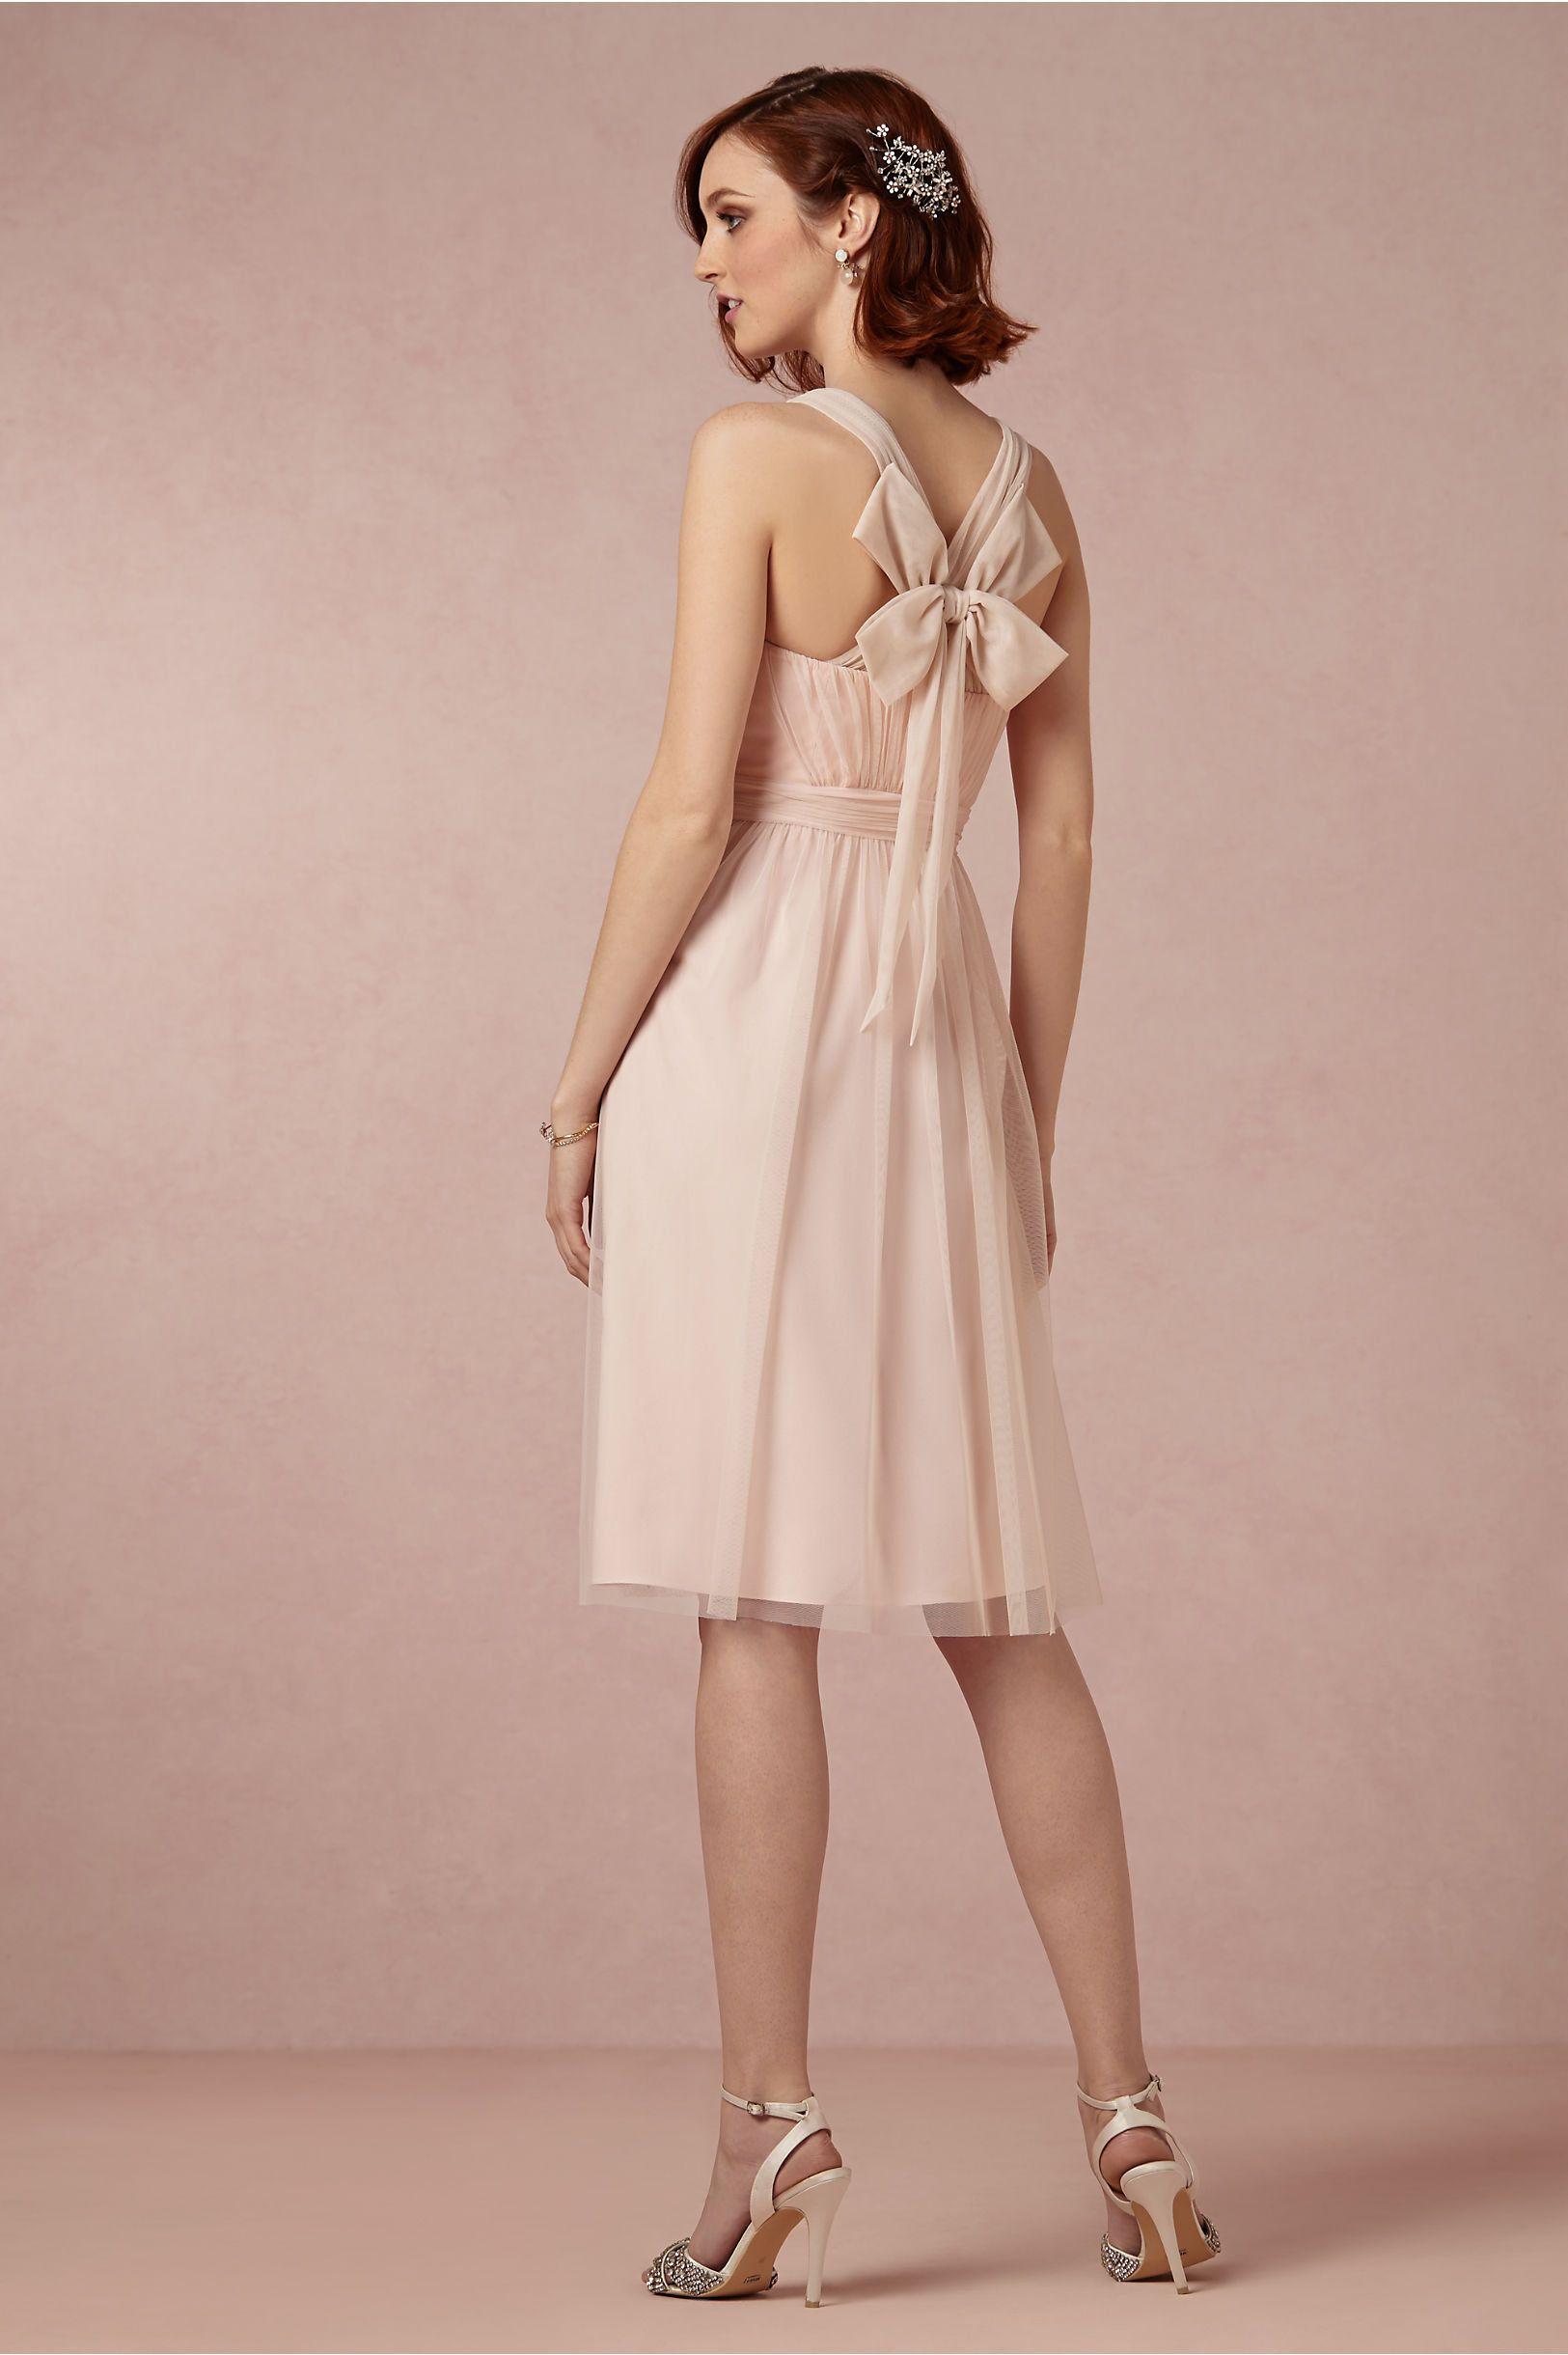 Tansy dress short dresses pinterest shorts